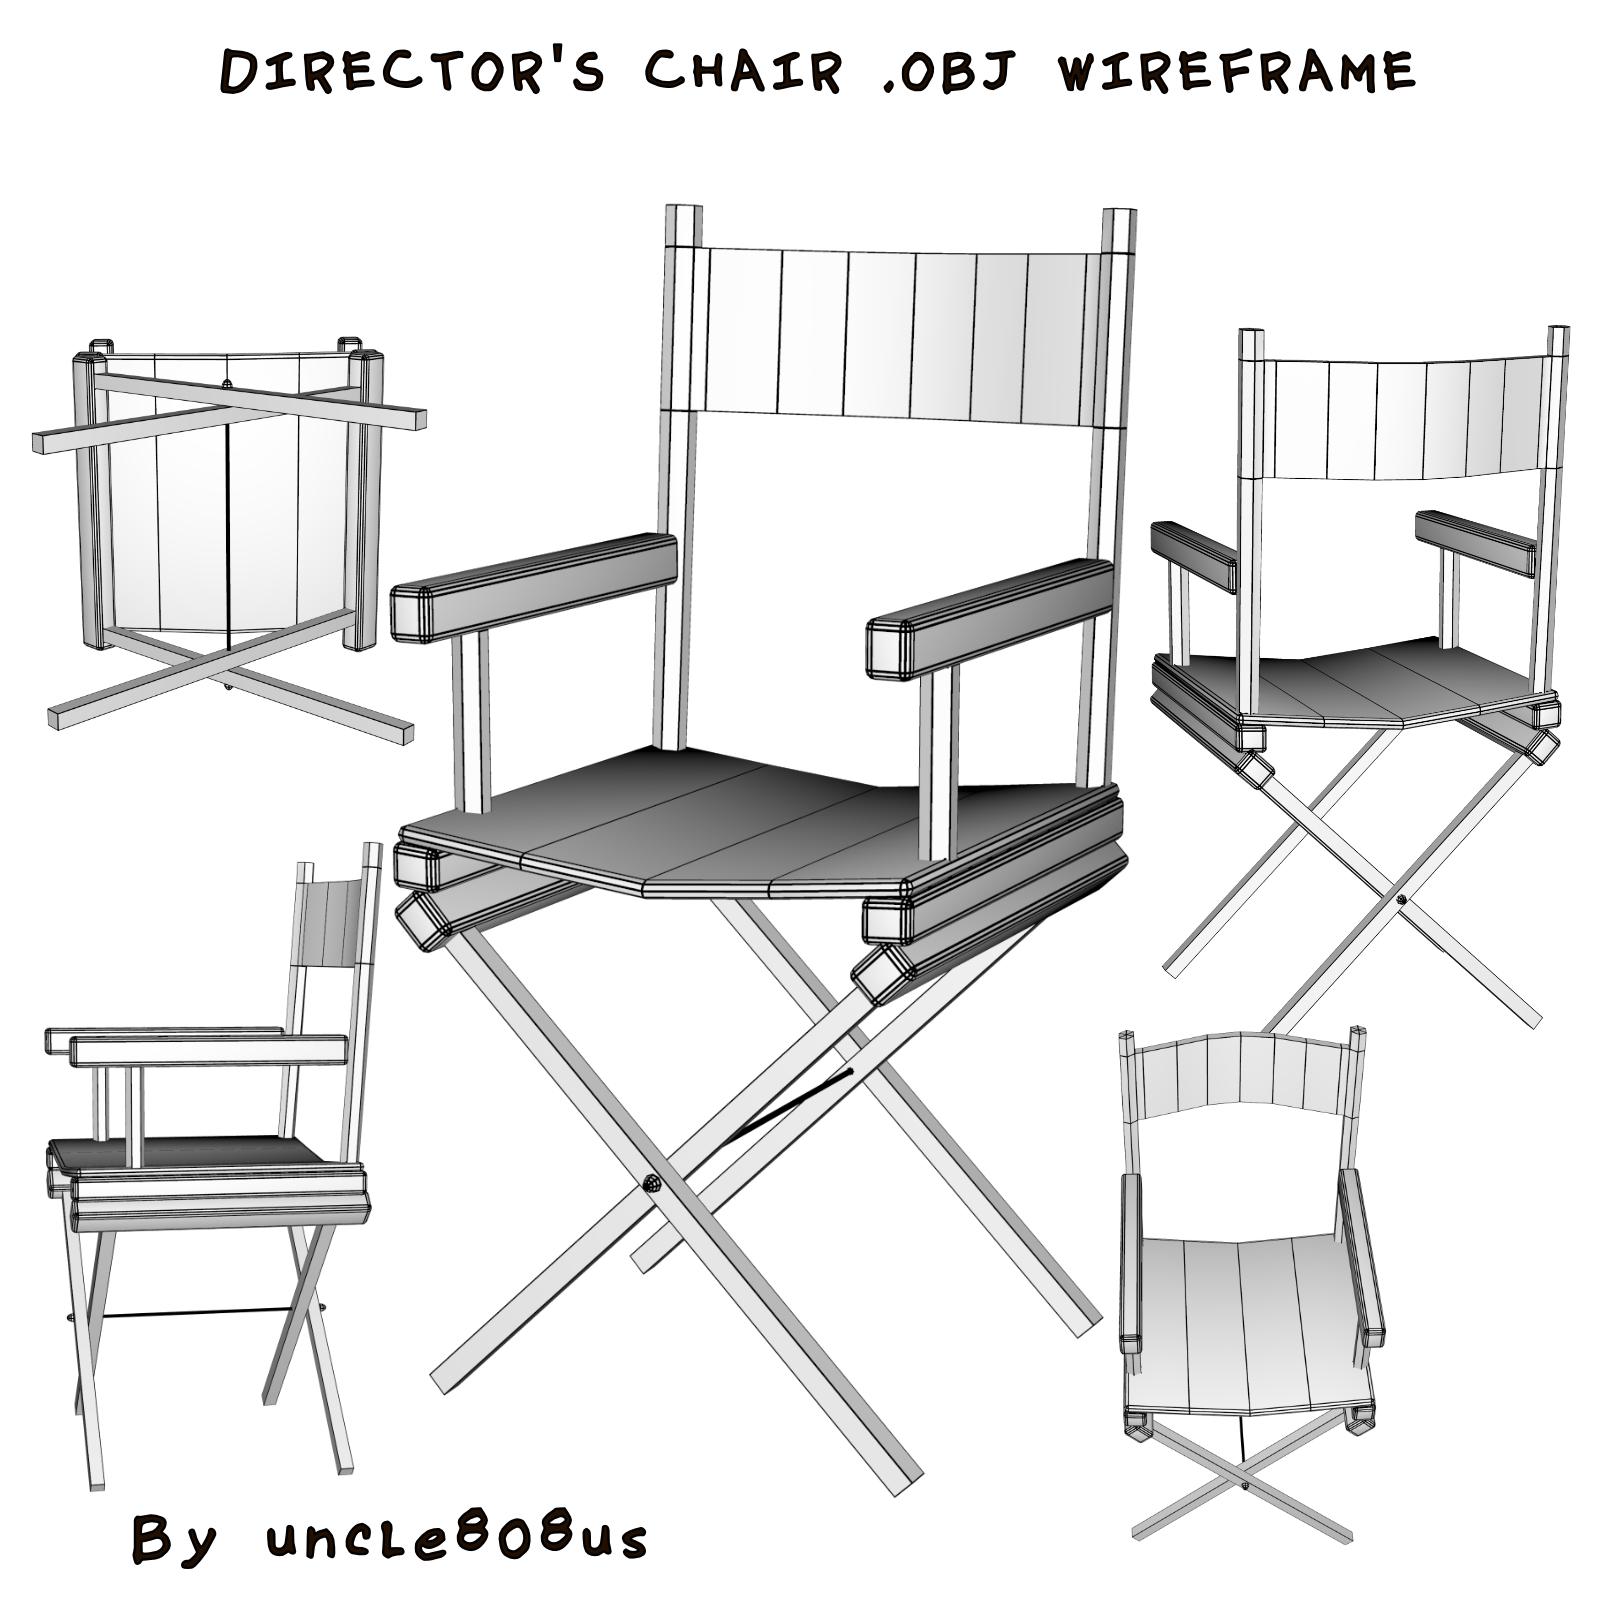 režisora krēsls 3d objekts 3d modelis cits obj 274164